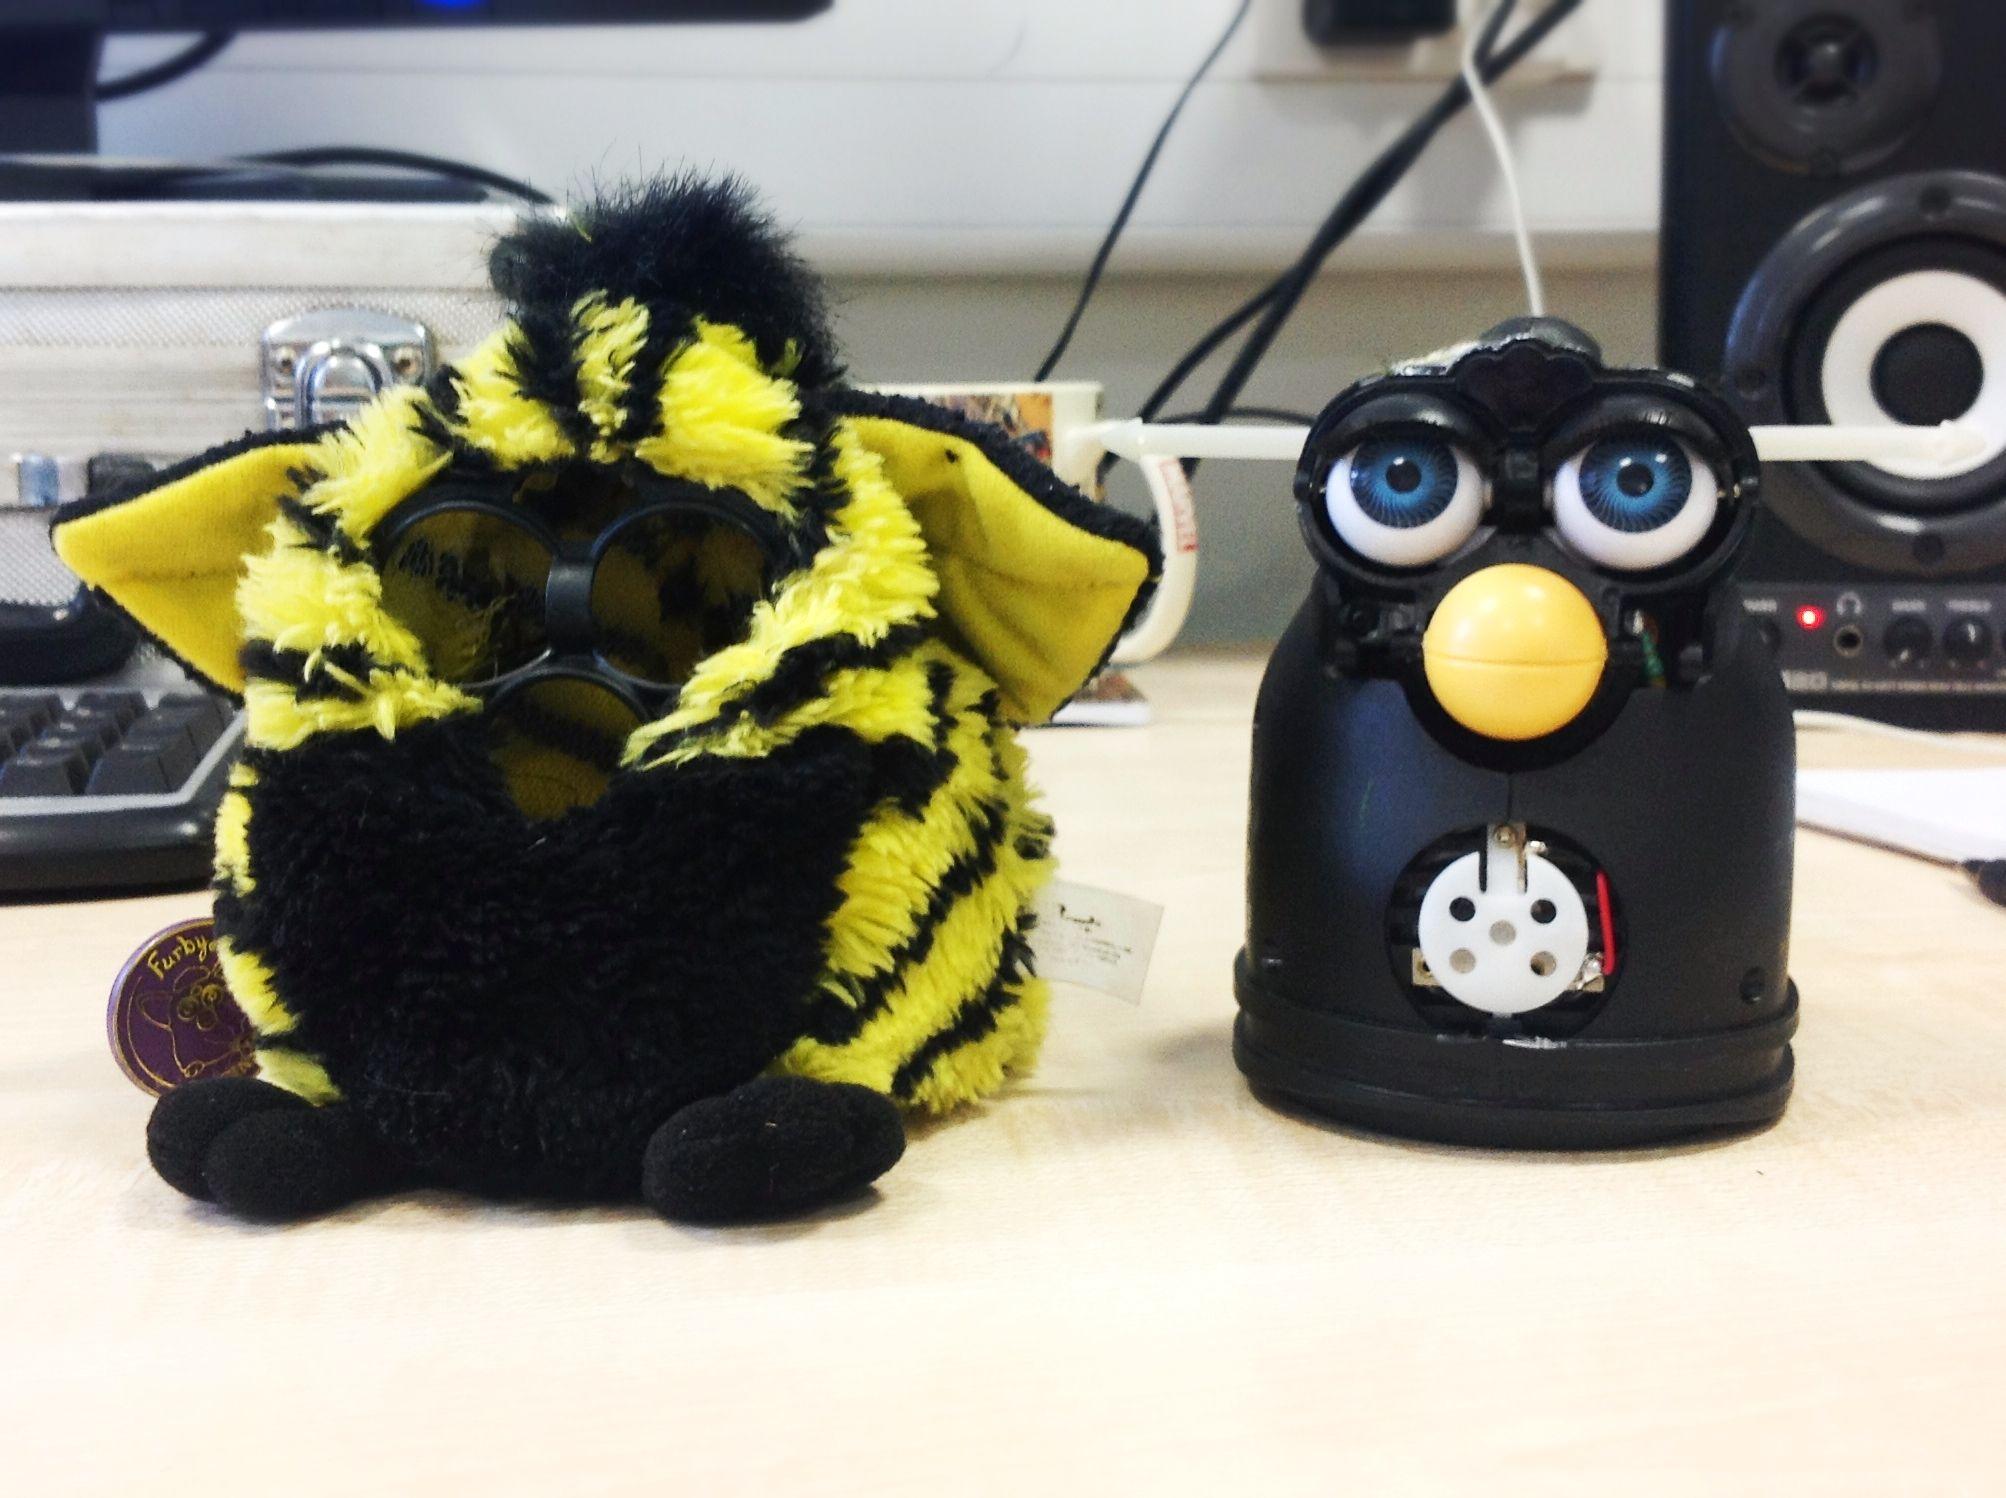 Furby Skin Furby Robotic Toys Gaming Products